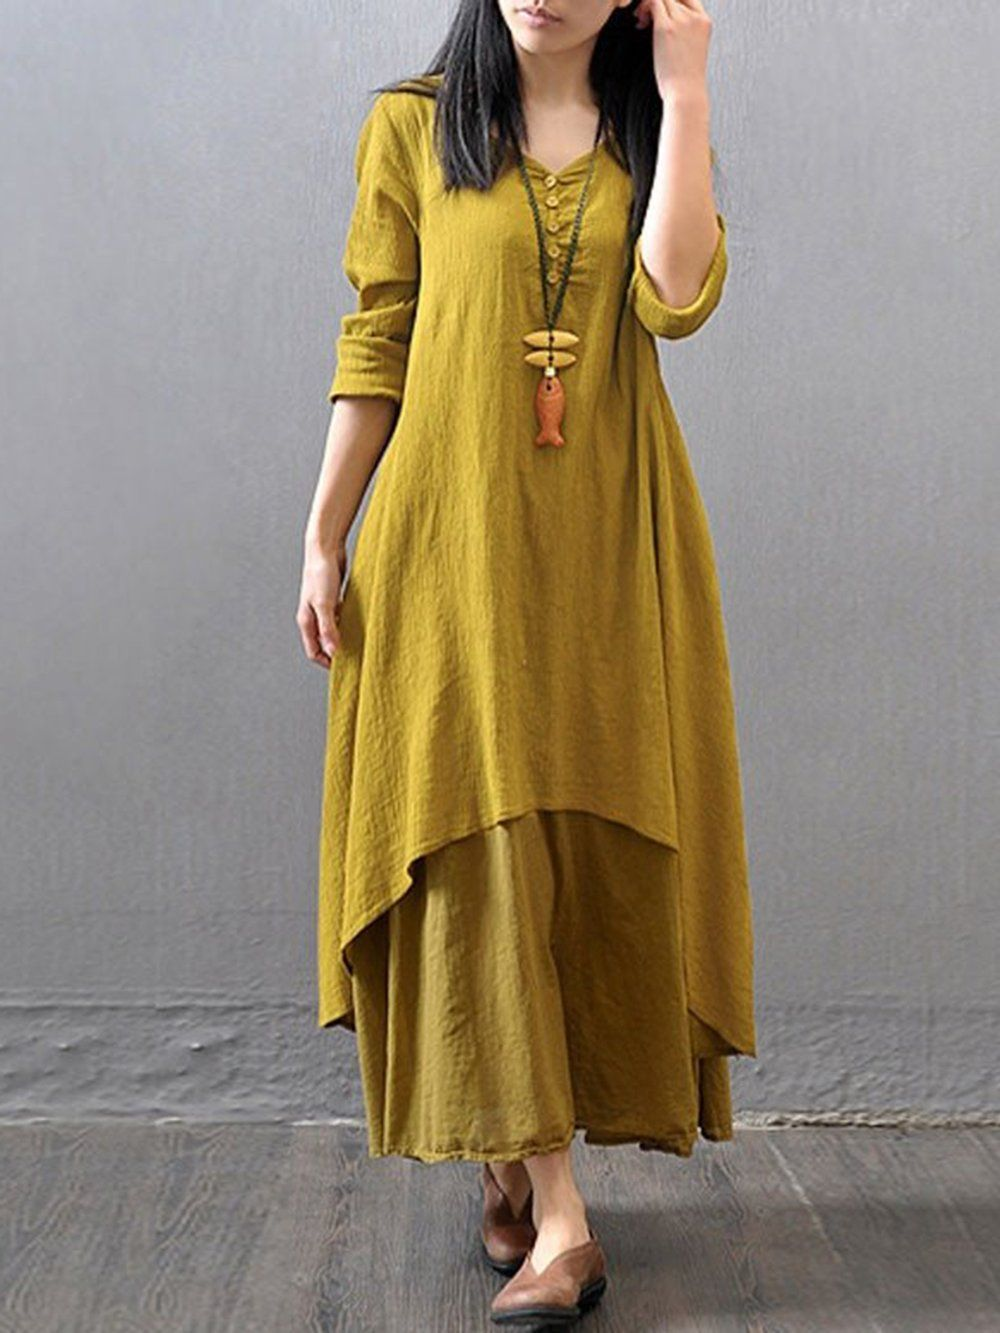 Shop Dresss 3 4 Sleeve Solid Asymmetrical Asymmetric Dresss Online Discover Unique Designers Maxi Dress With Sleeves Long Sleeve Maxi Dress Linen Maxi Dress [ 1333 x 1000 Pixel ]